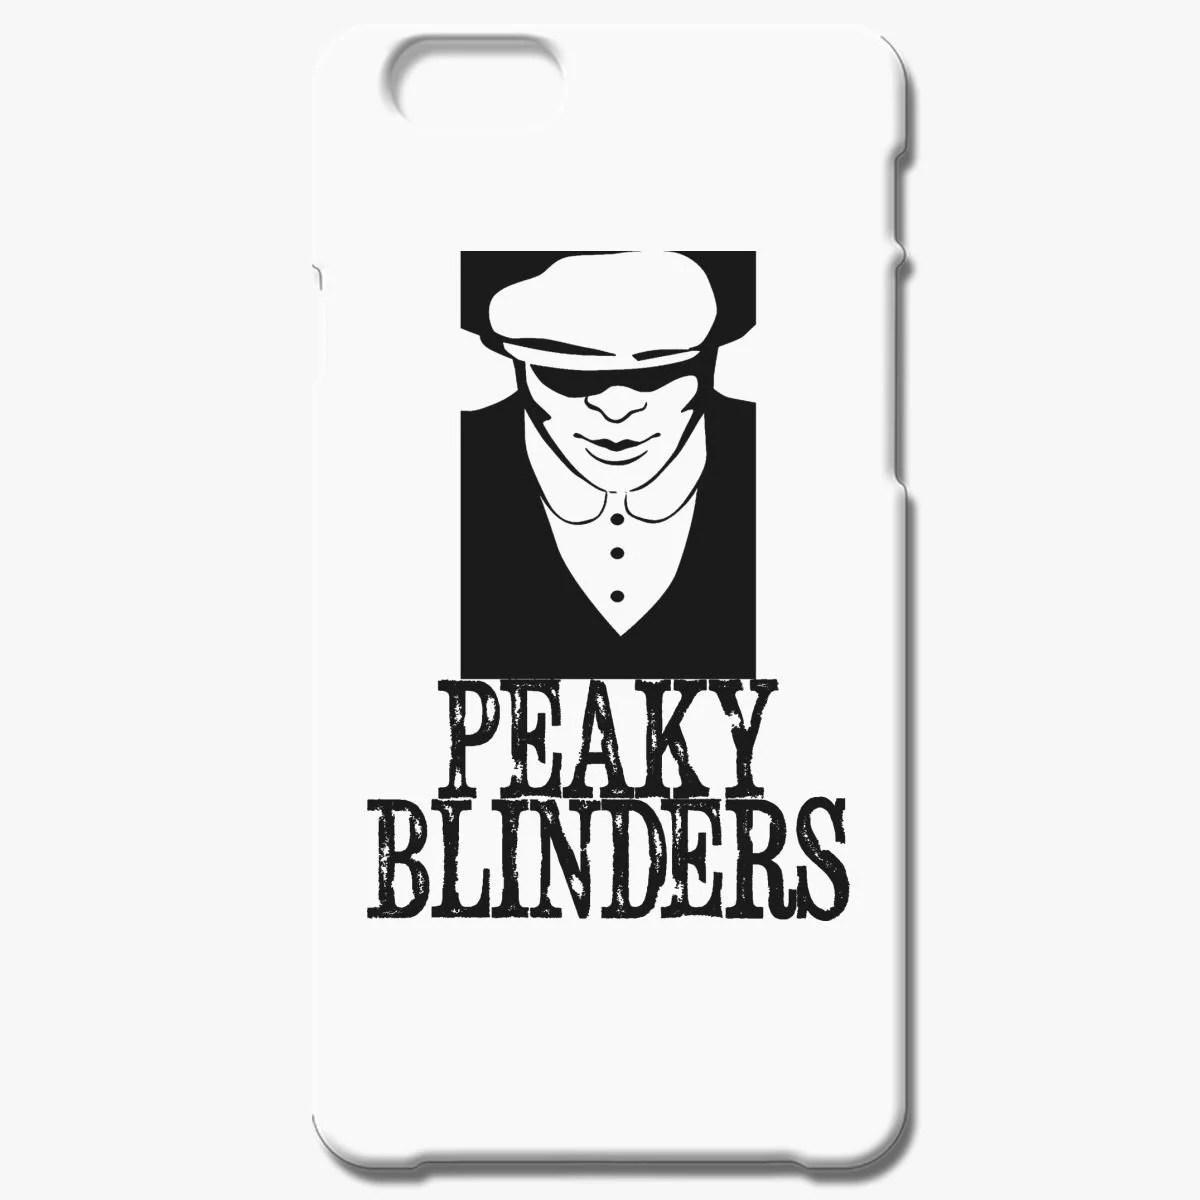 The Peaky Blinders Iphone 6 6s Case